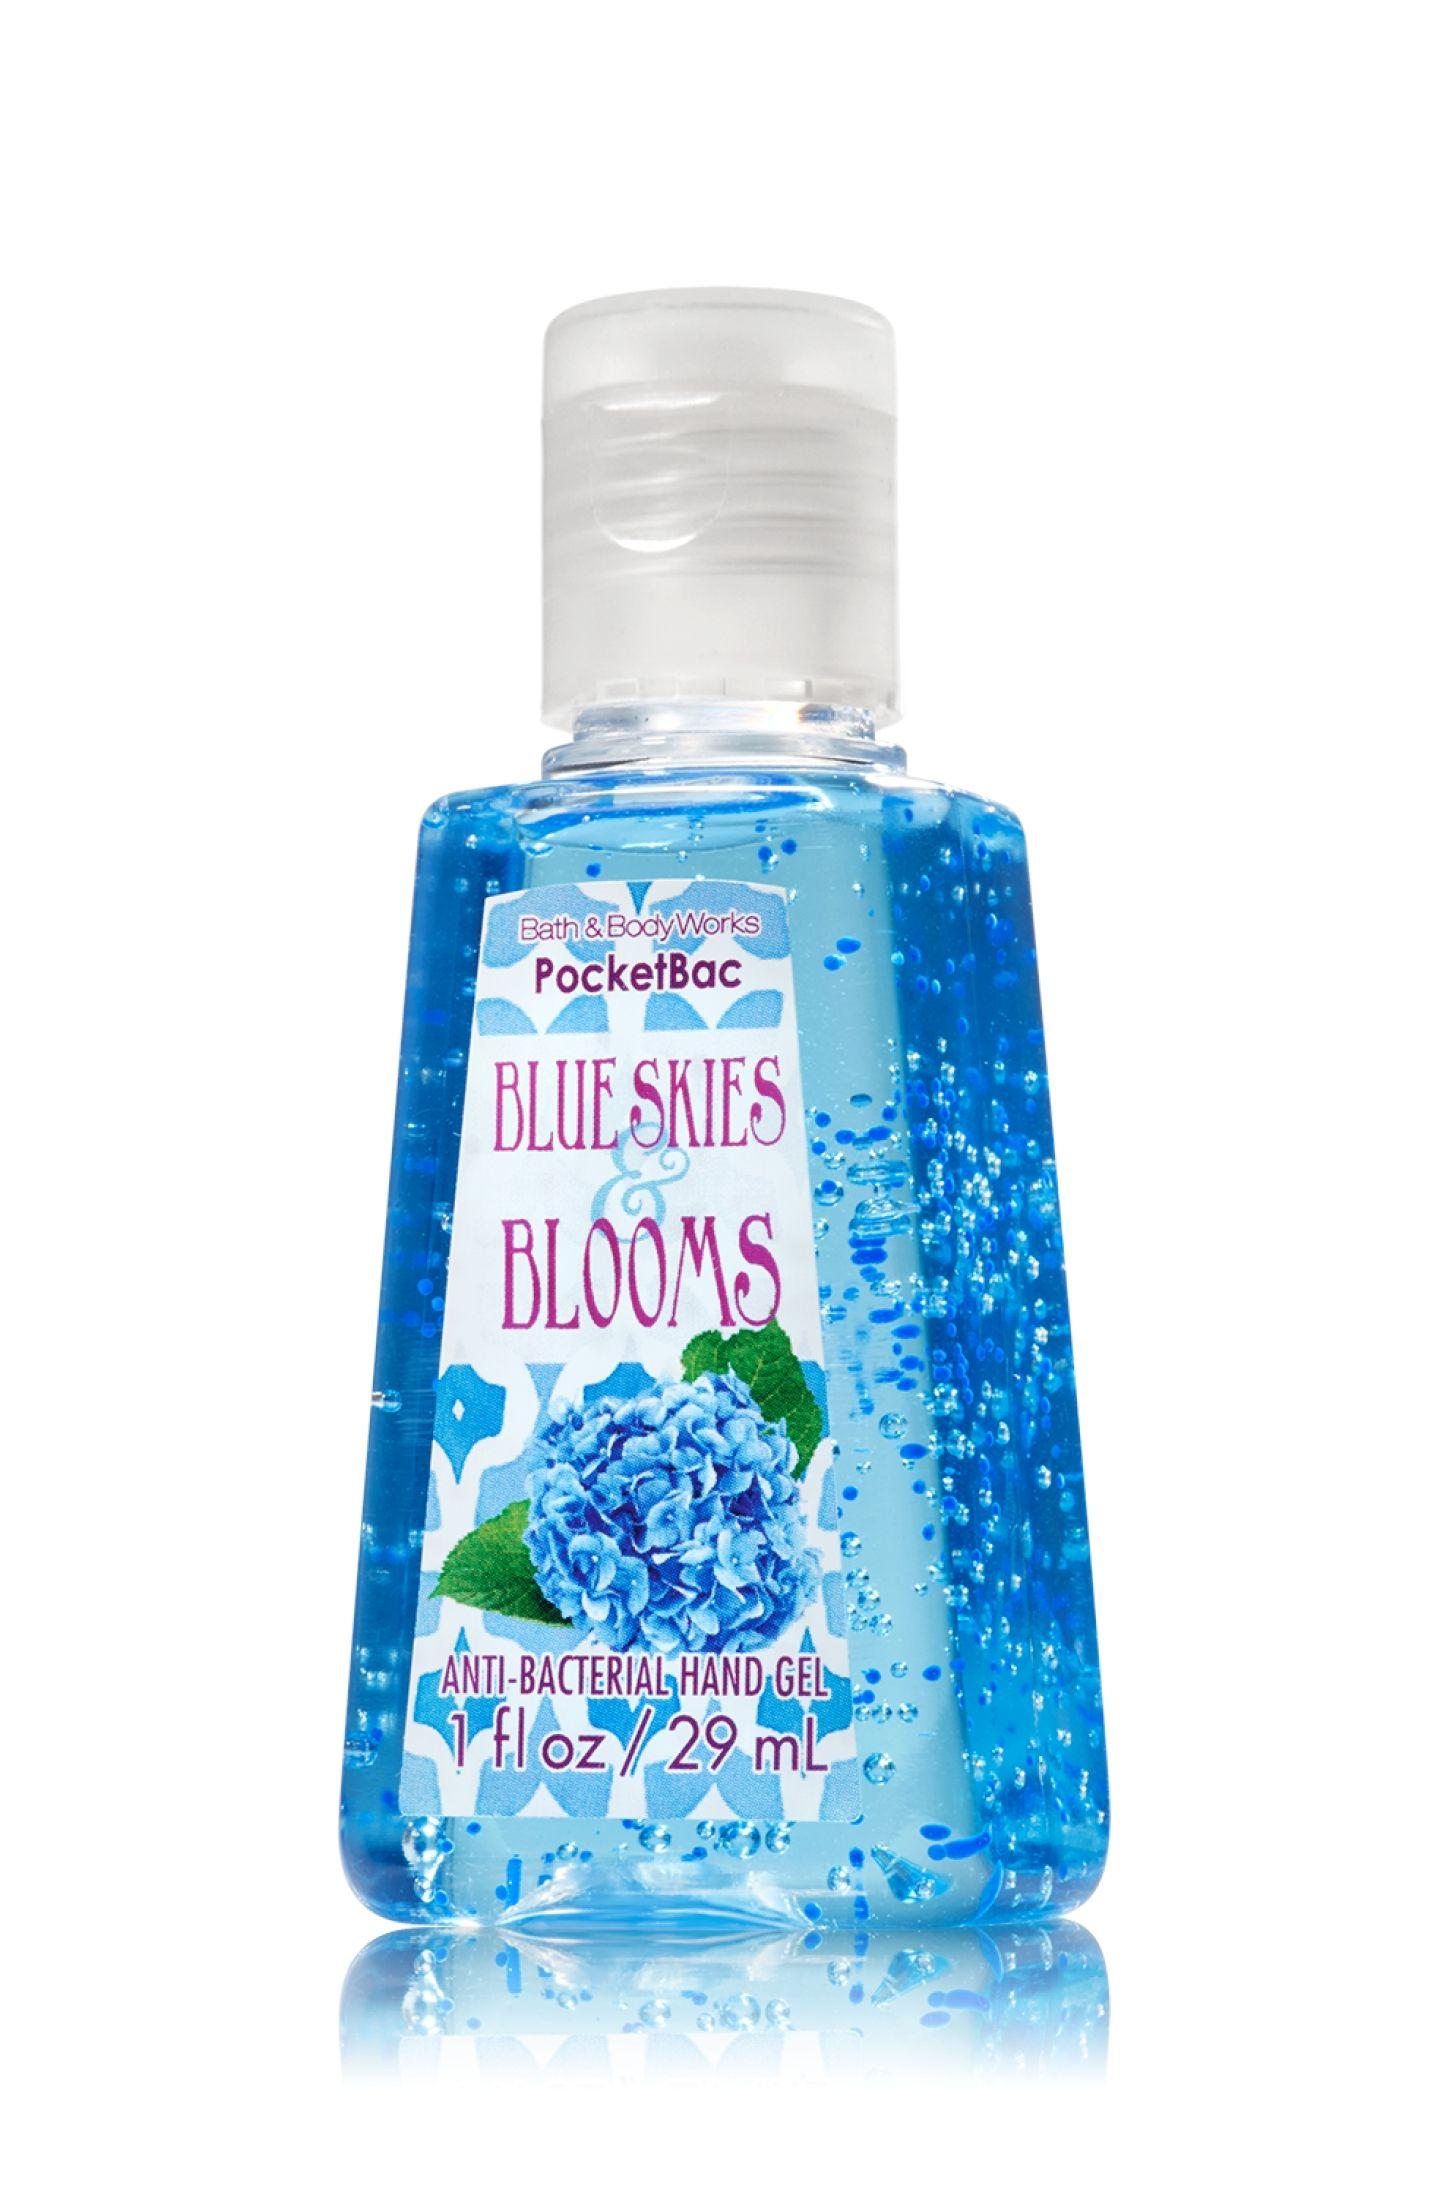 Blue Skies Blooms Bath Body Works Pocketbac Sanitizing Hand